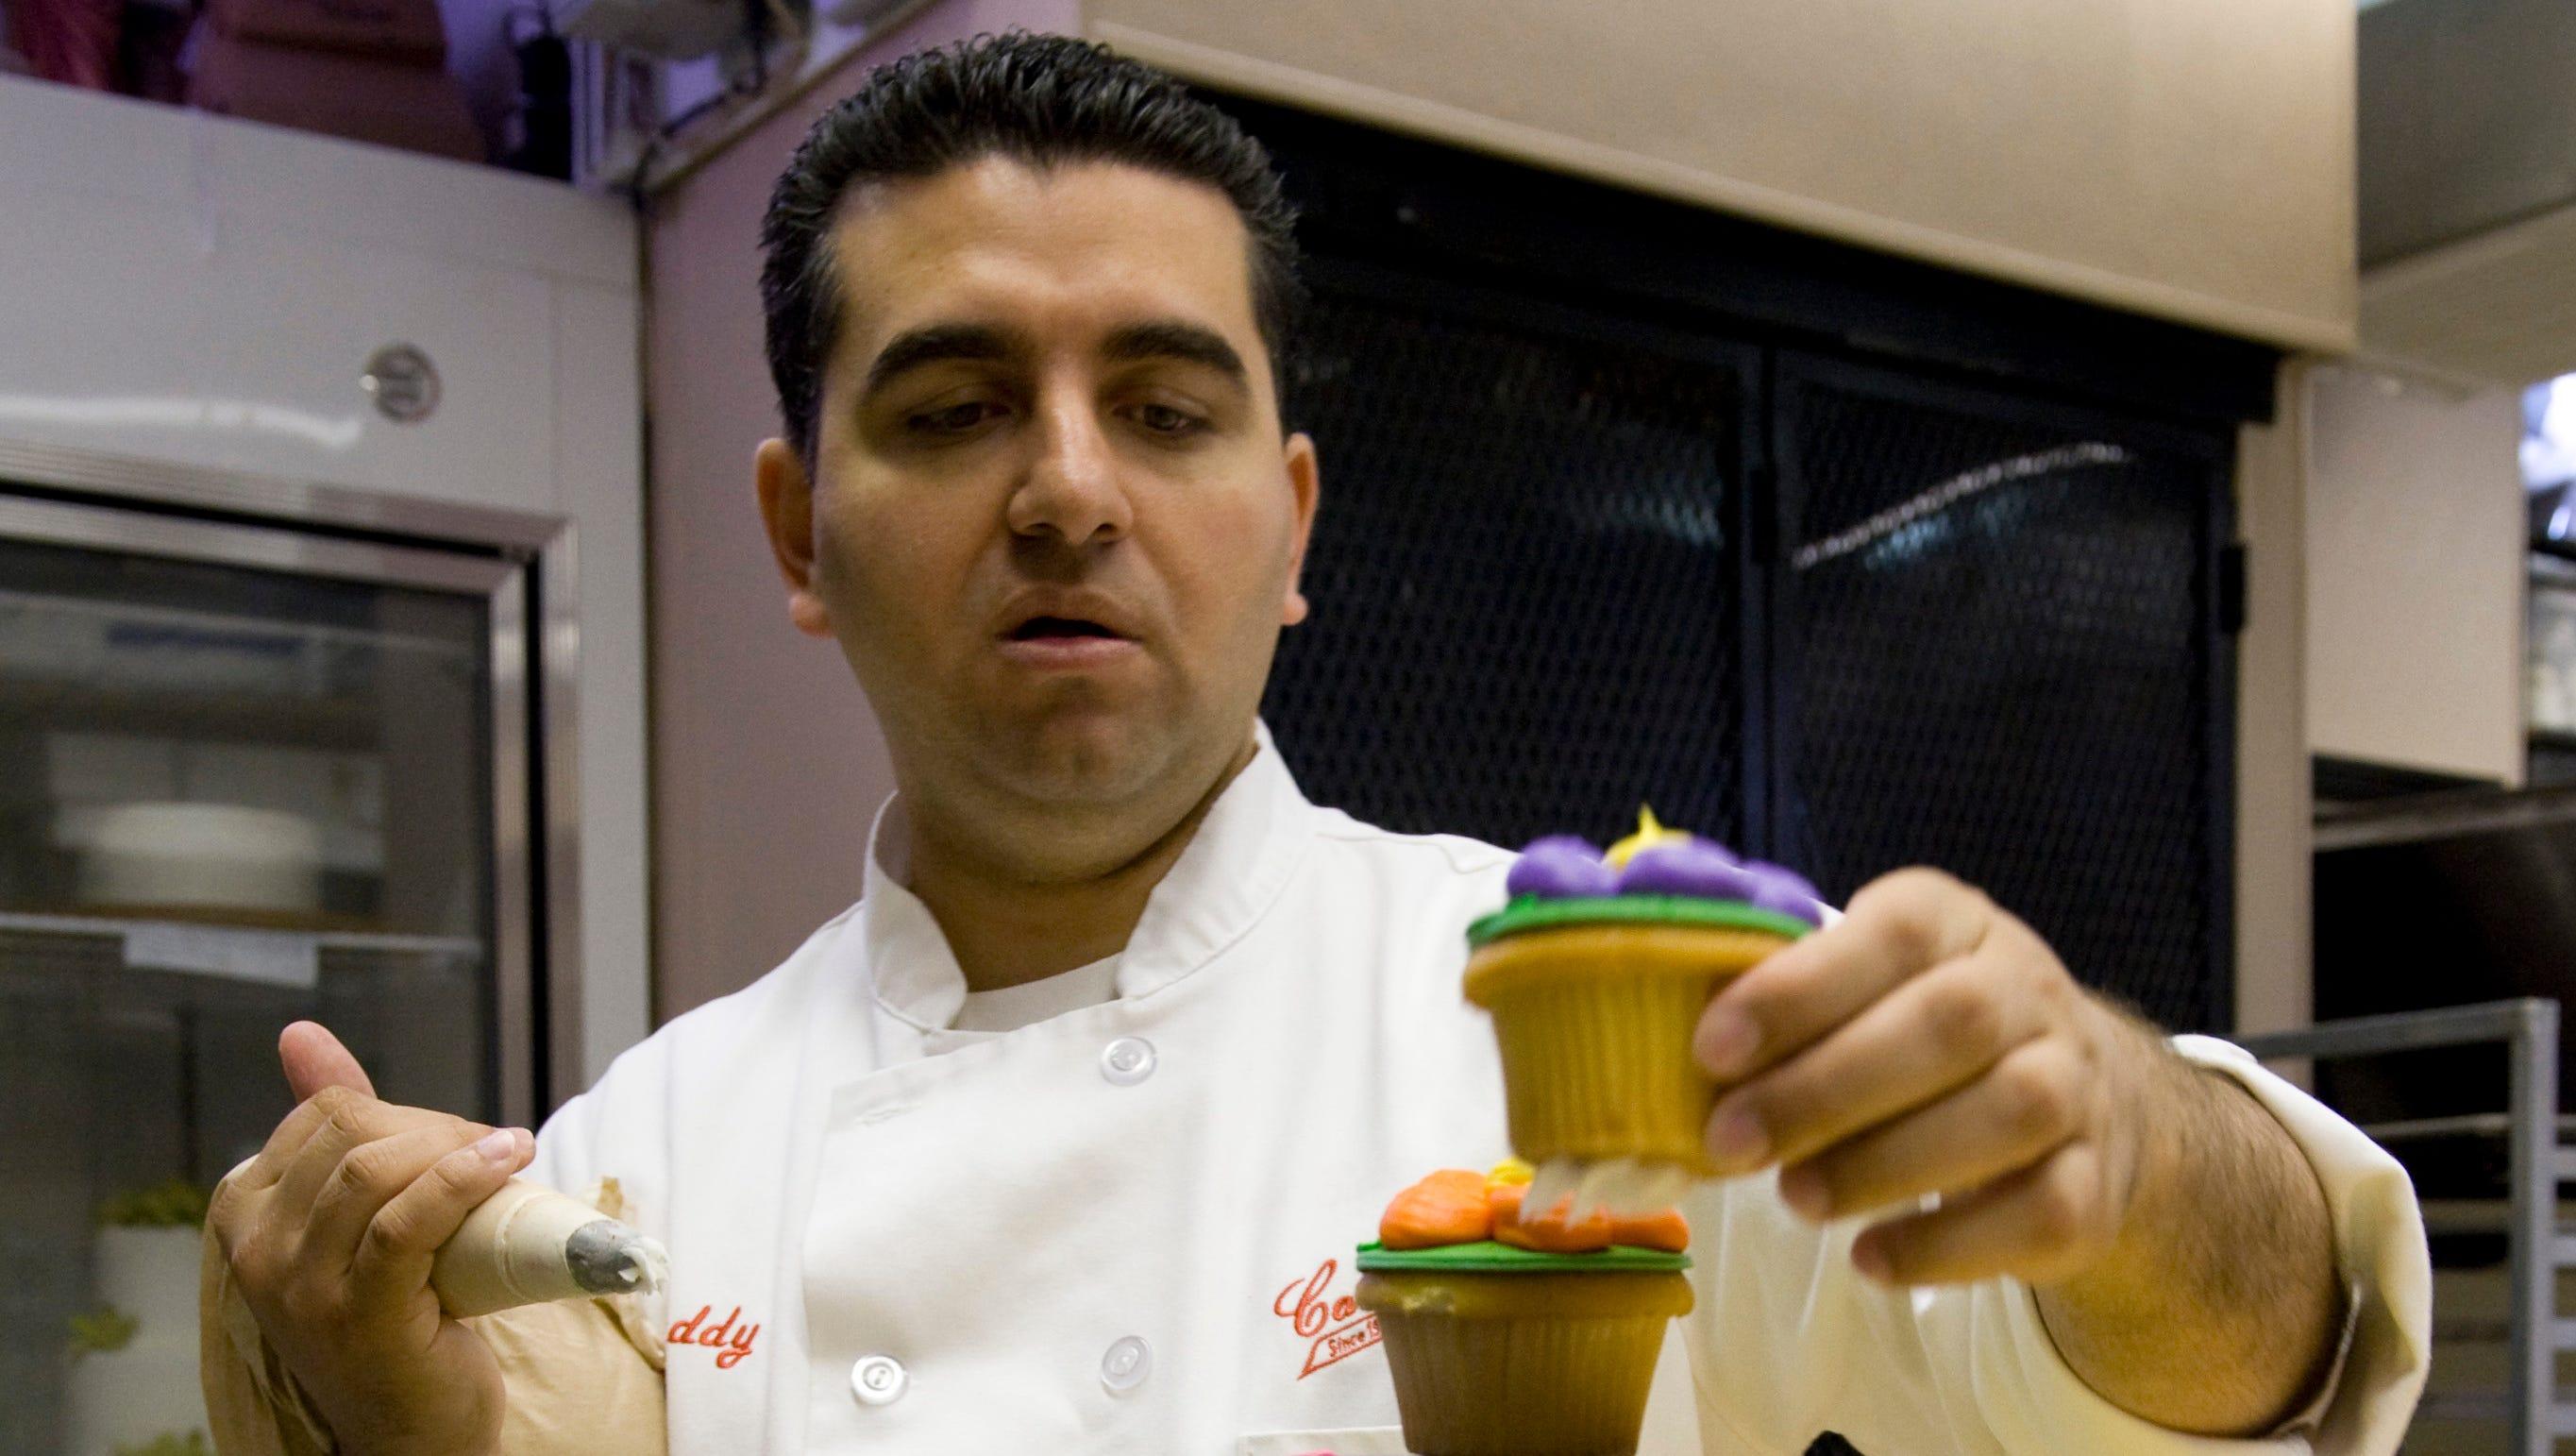 cake boss accident - photo #19